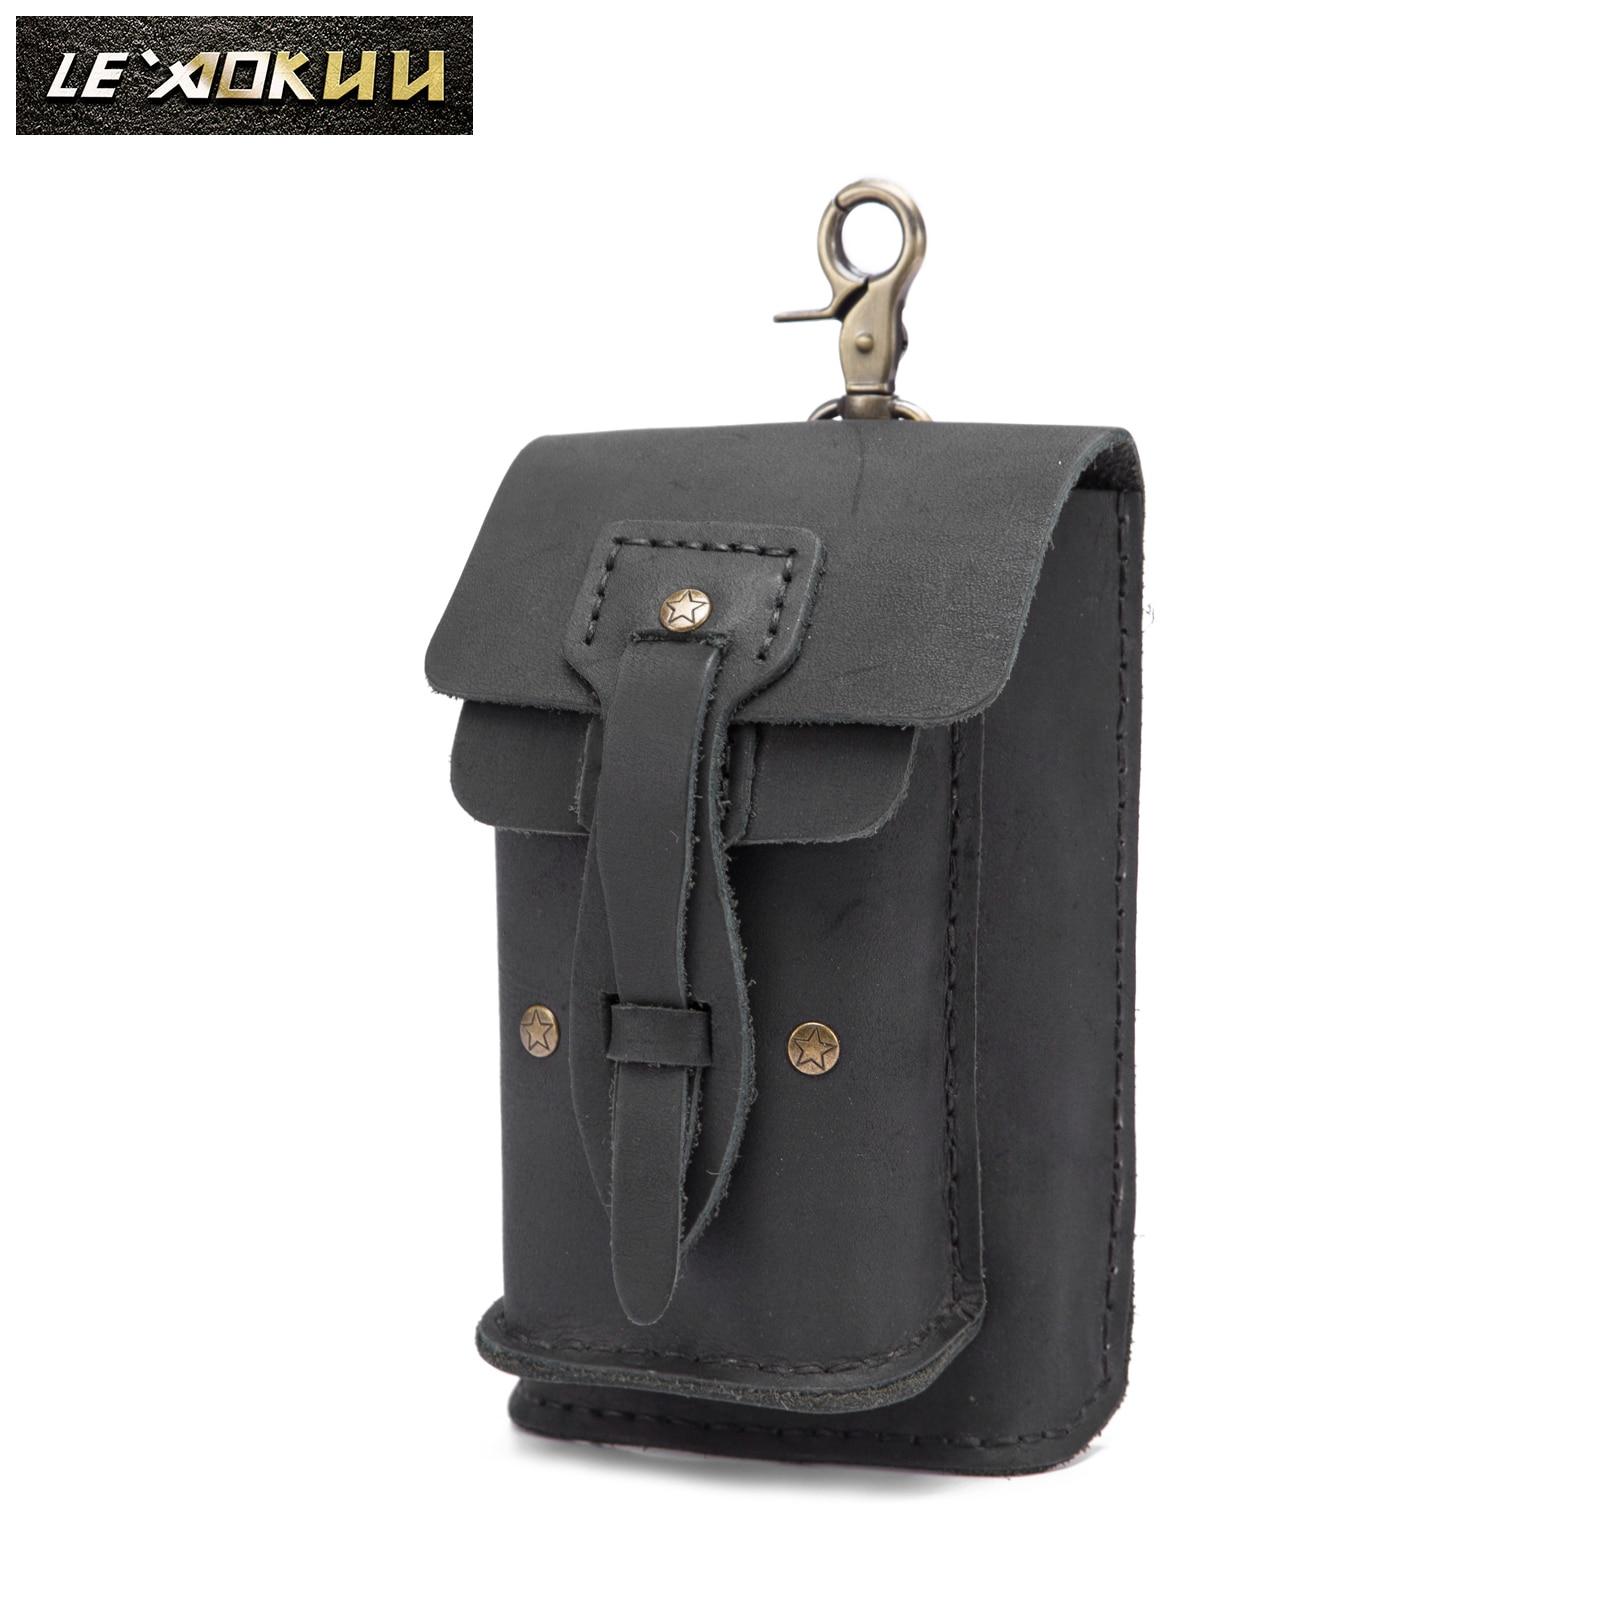 Crazy Horse Leather Men Casual Design Small Waist Bag Ashion Hook Bum Bag Waist Belt Pack Cigarette Case 5